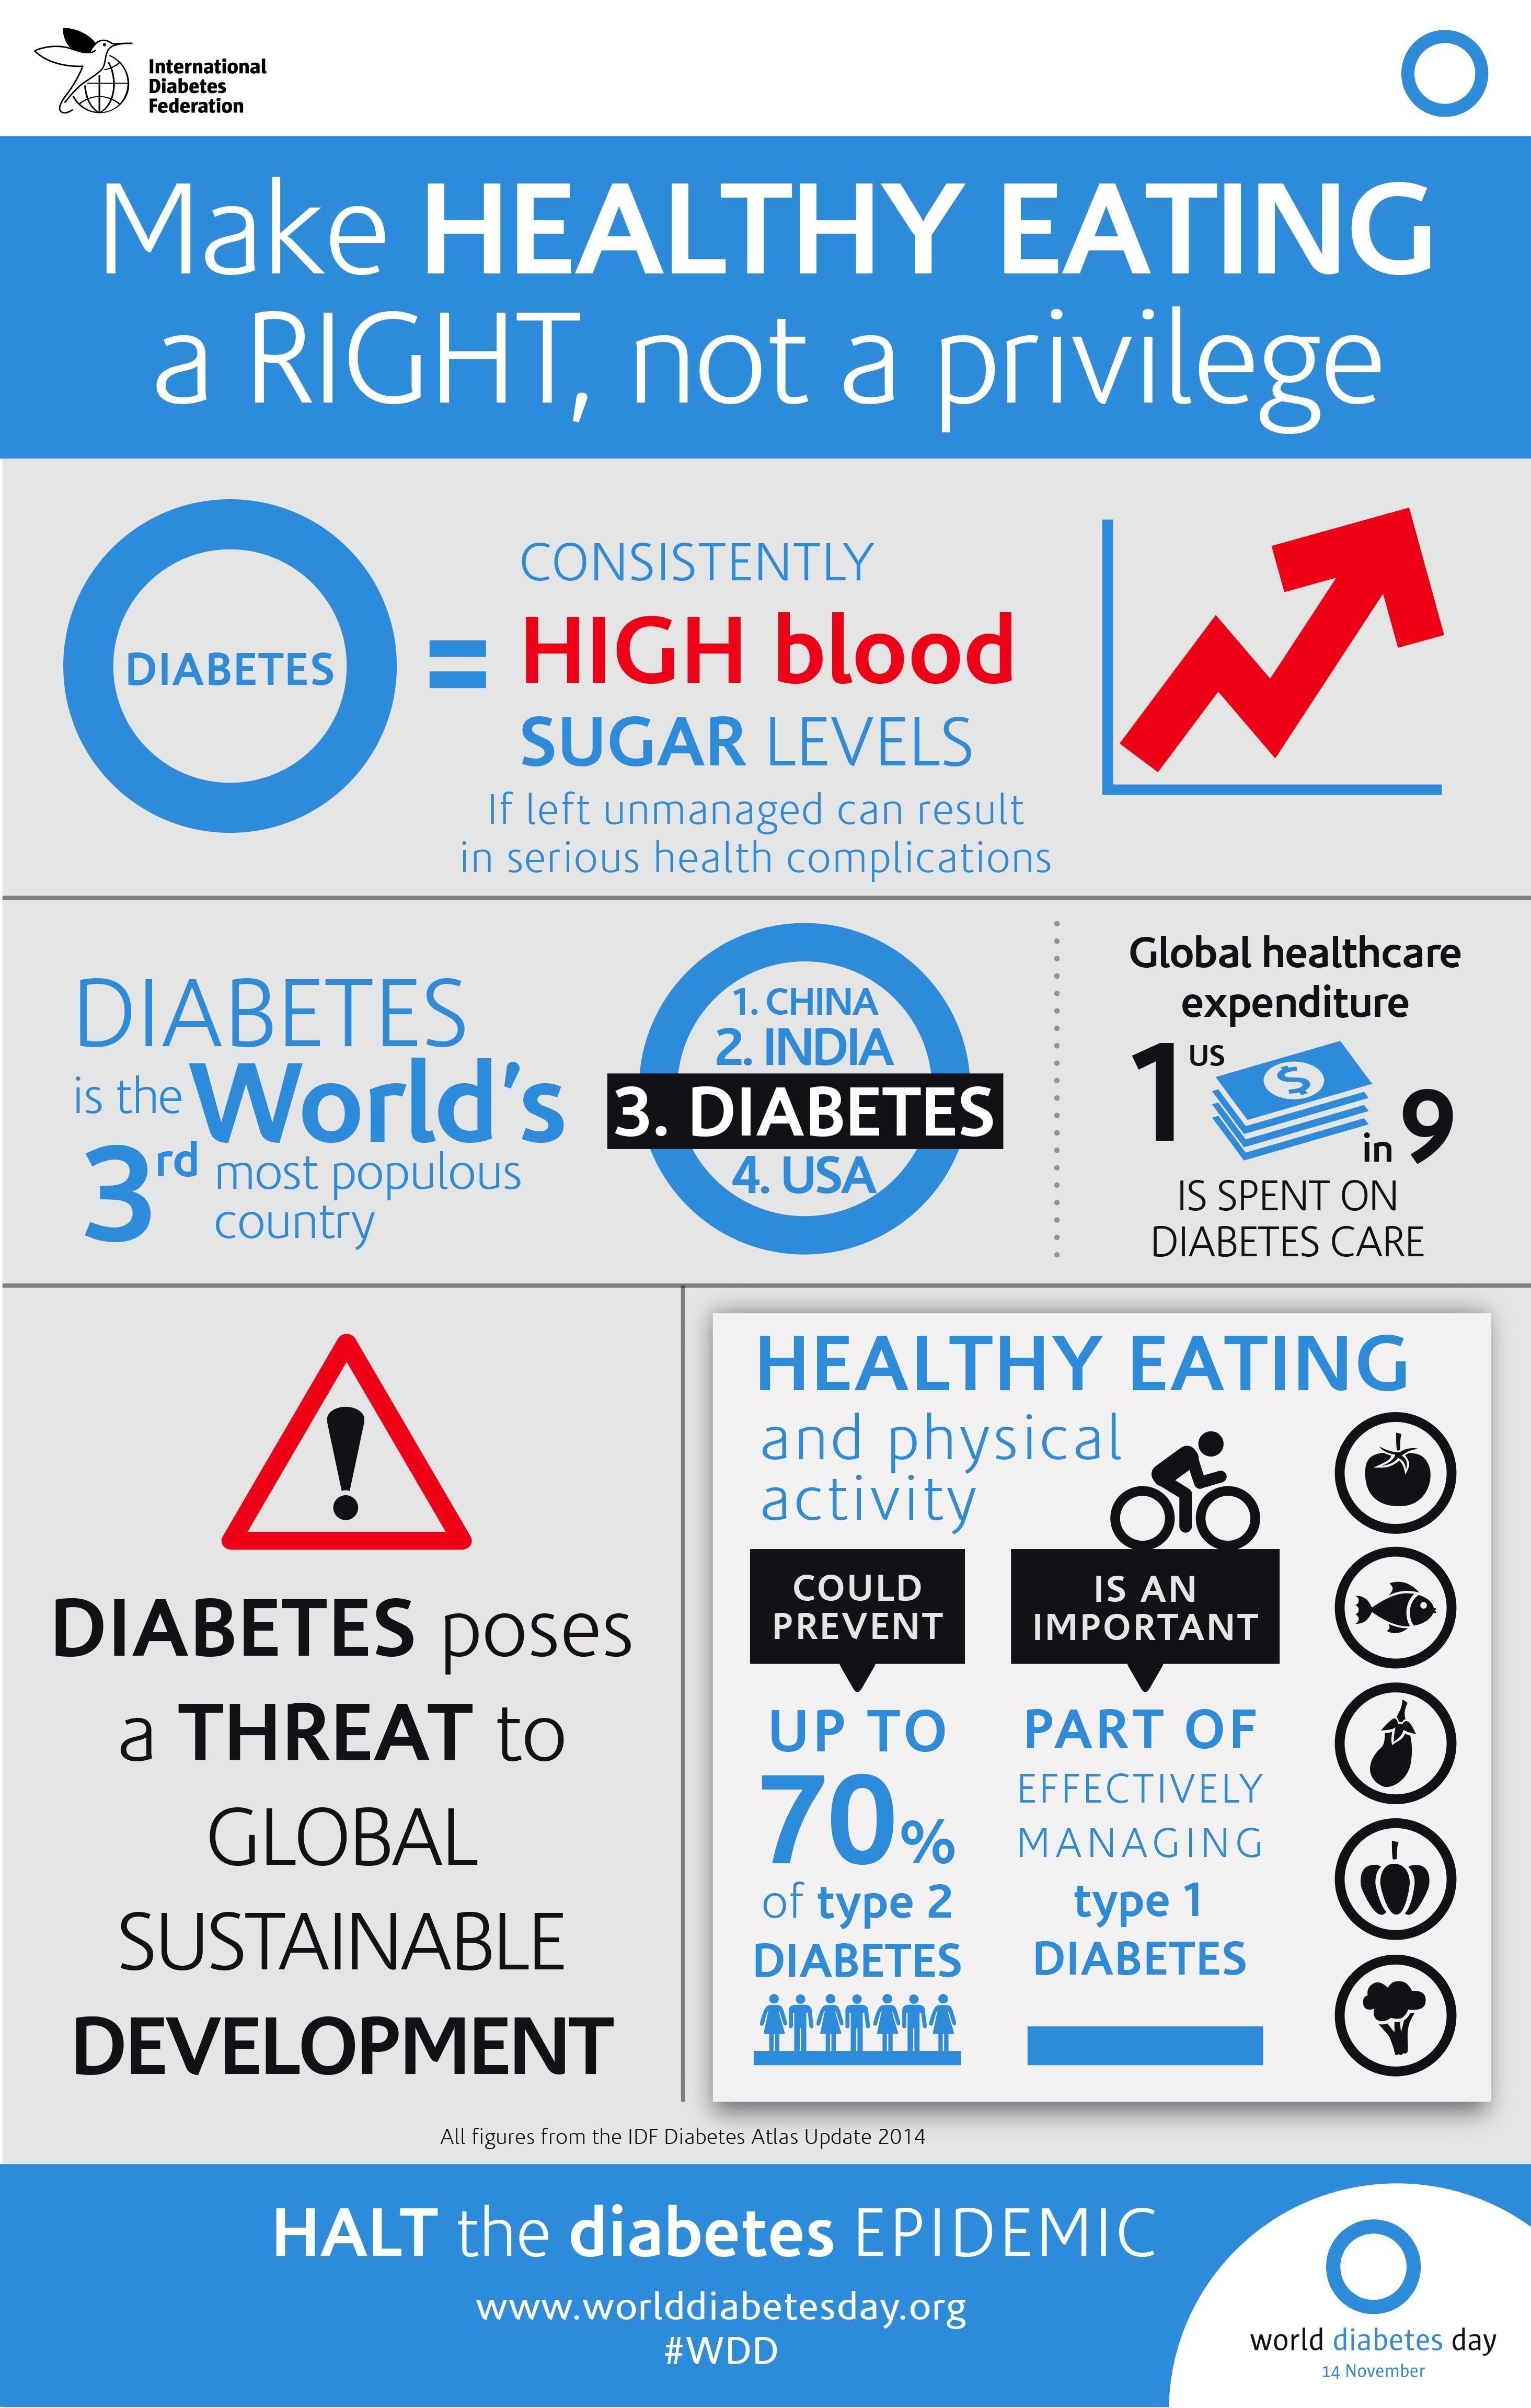 World Diabetes Day 2017 Logo